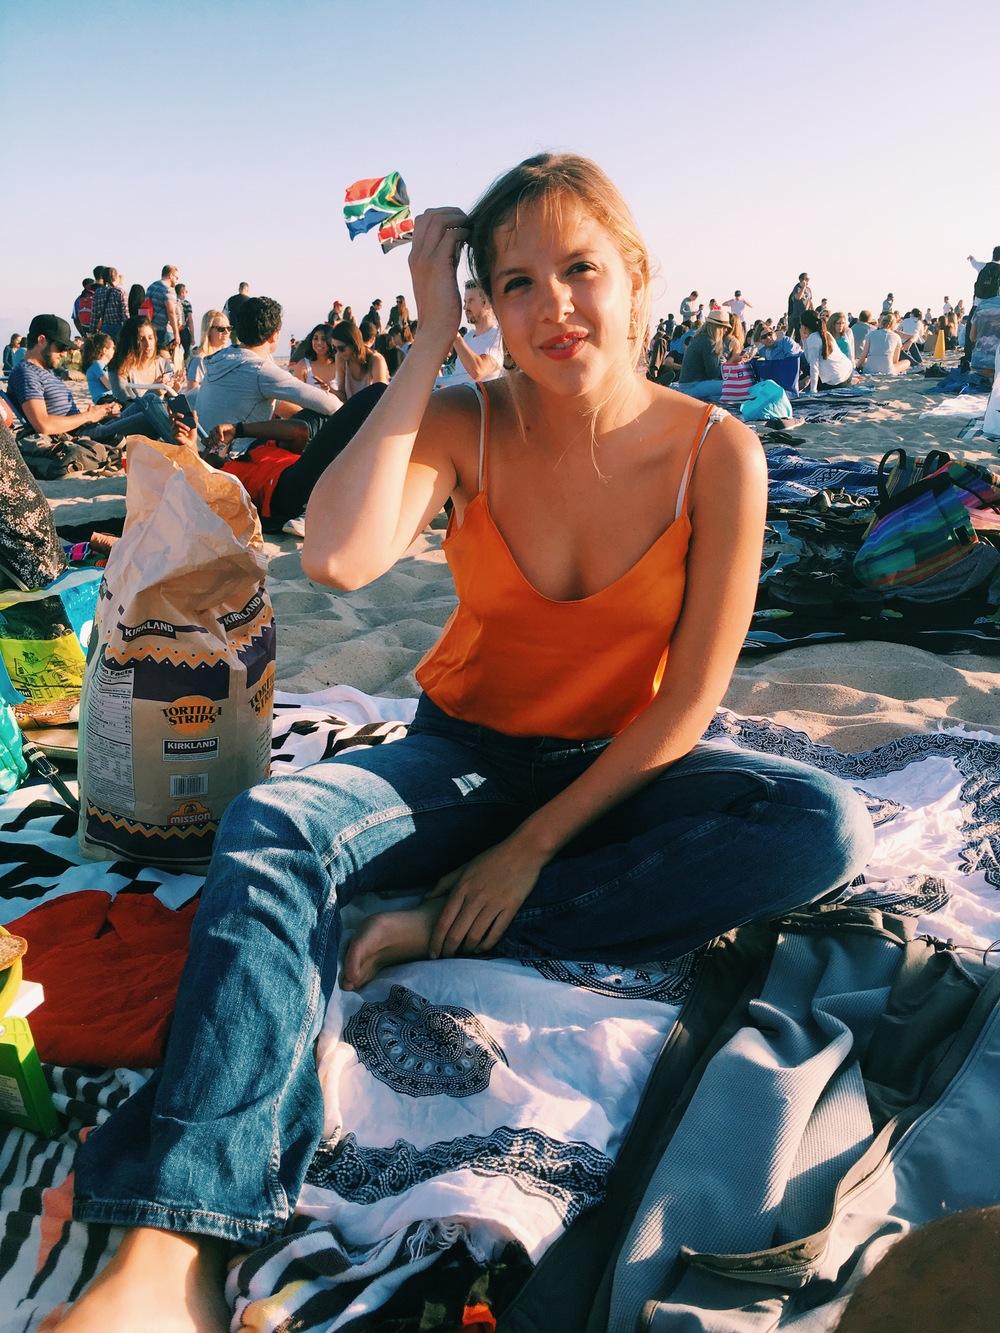 Beach concert by Santa Monica Pier